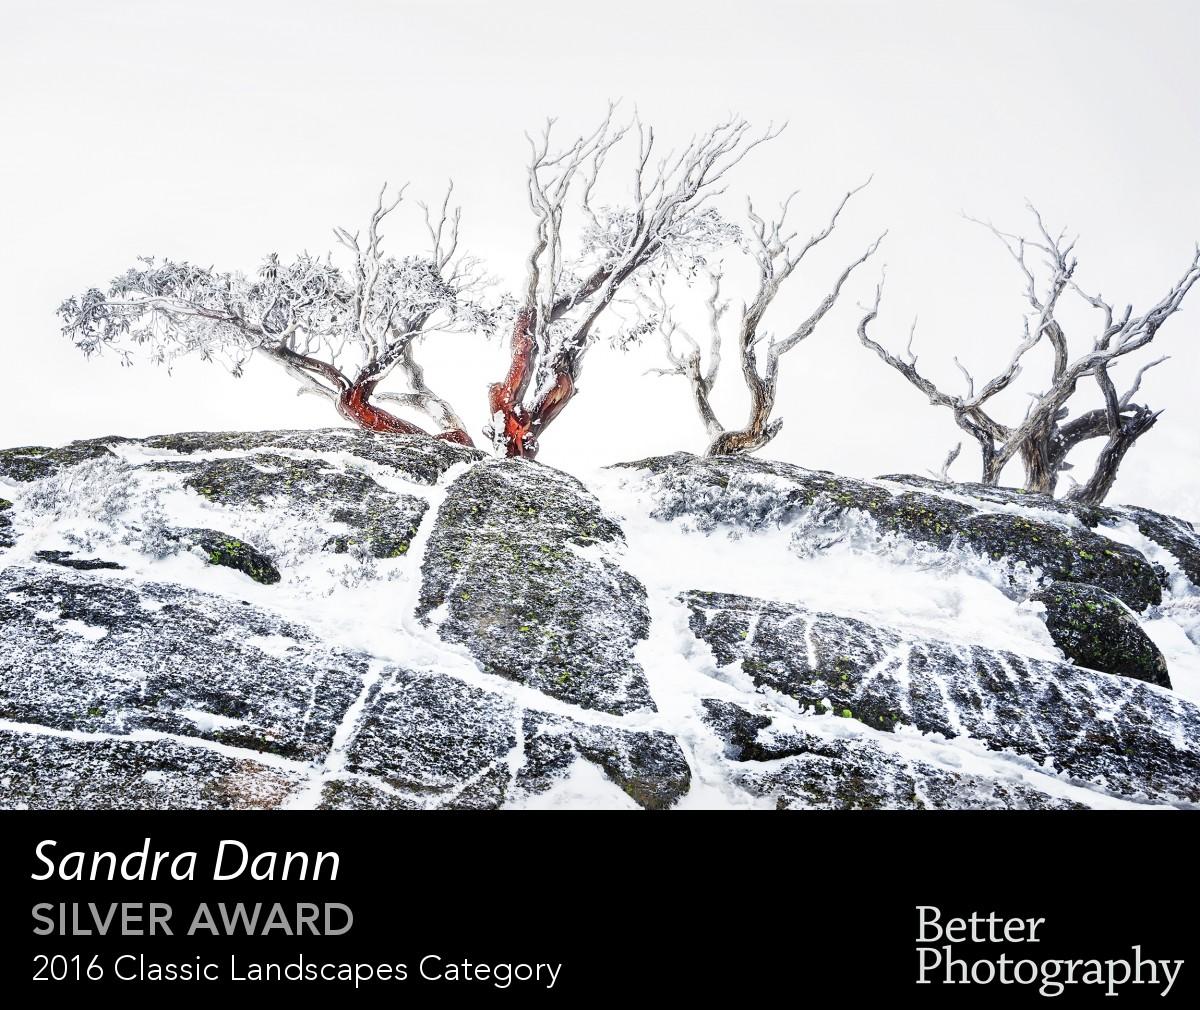 award_1085_1086_3826055466.jpg